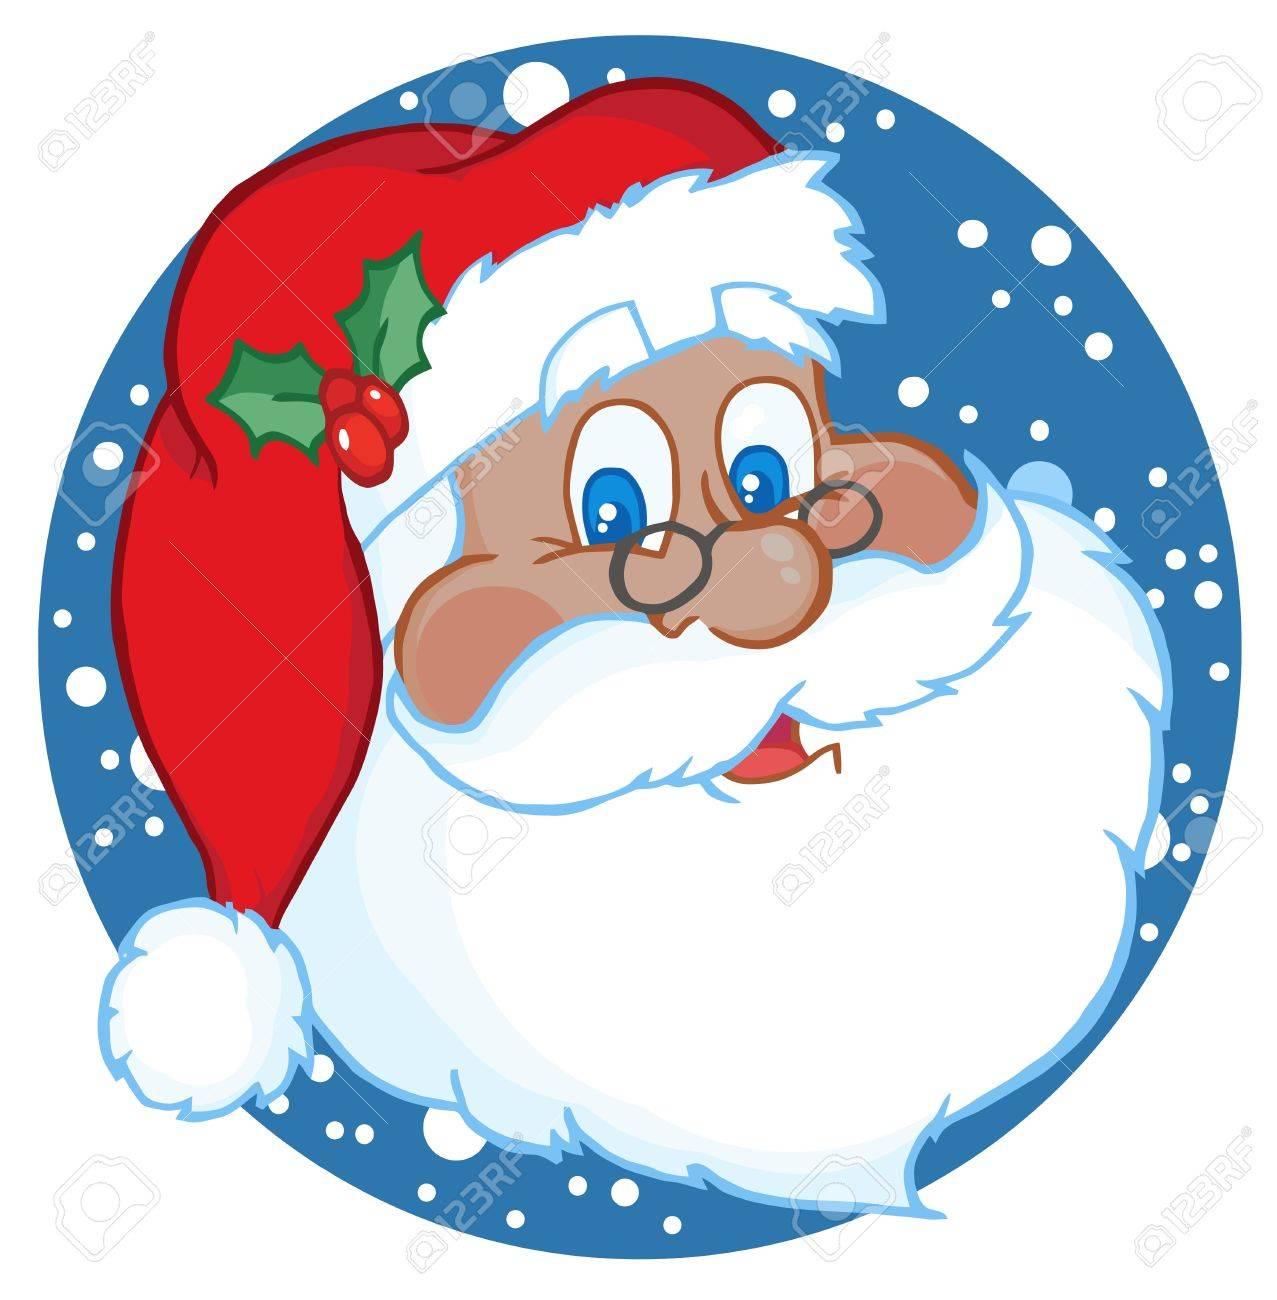 19 544 santa face cliparts stock vector and royalty free santa face rh 123rf com santa face clip art black and white santa face clipart round